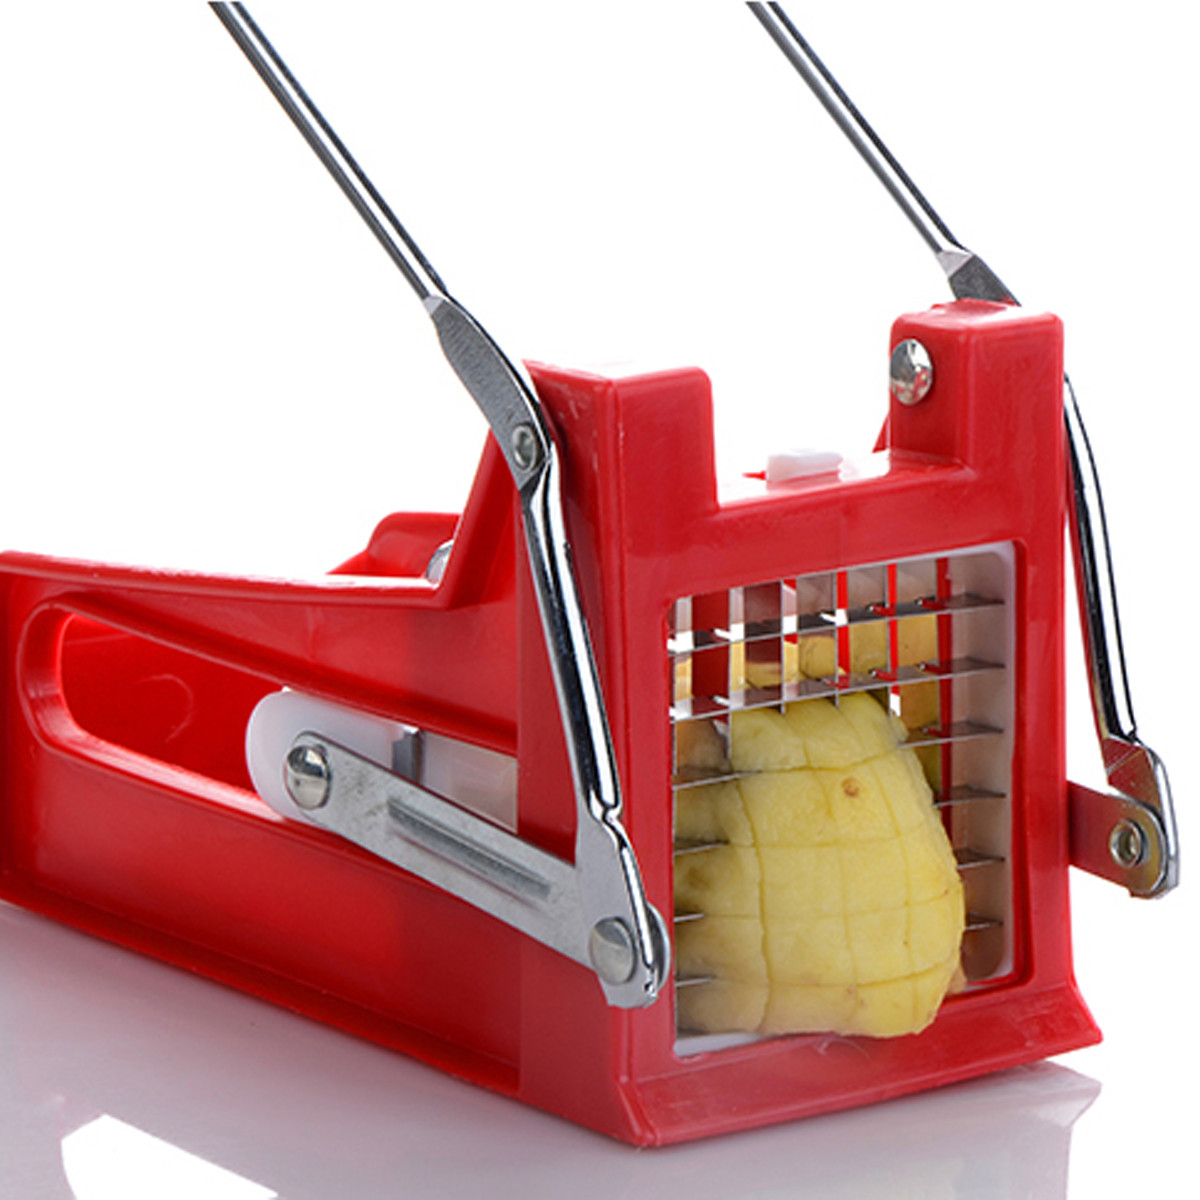 French Fries Cutters Stainless Steel Potato Chips Strip Cutting Machine Maker Slicer Chopper 2 Blades Kitchen Gadgets